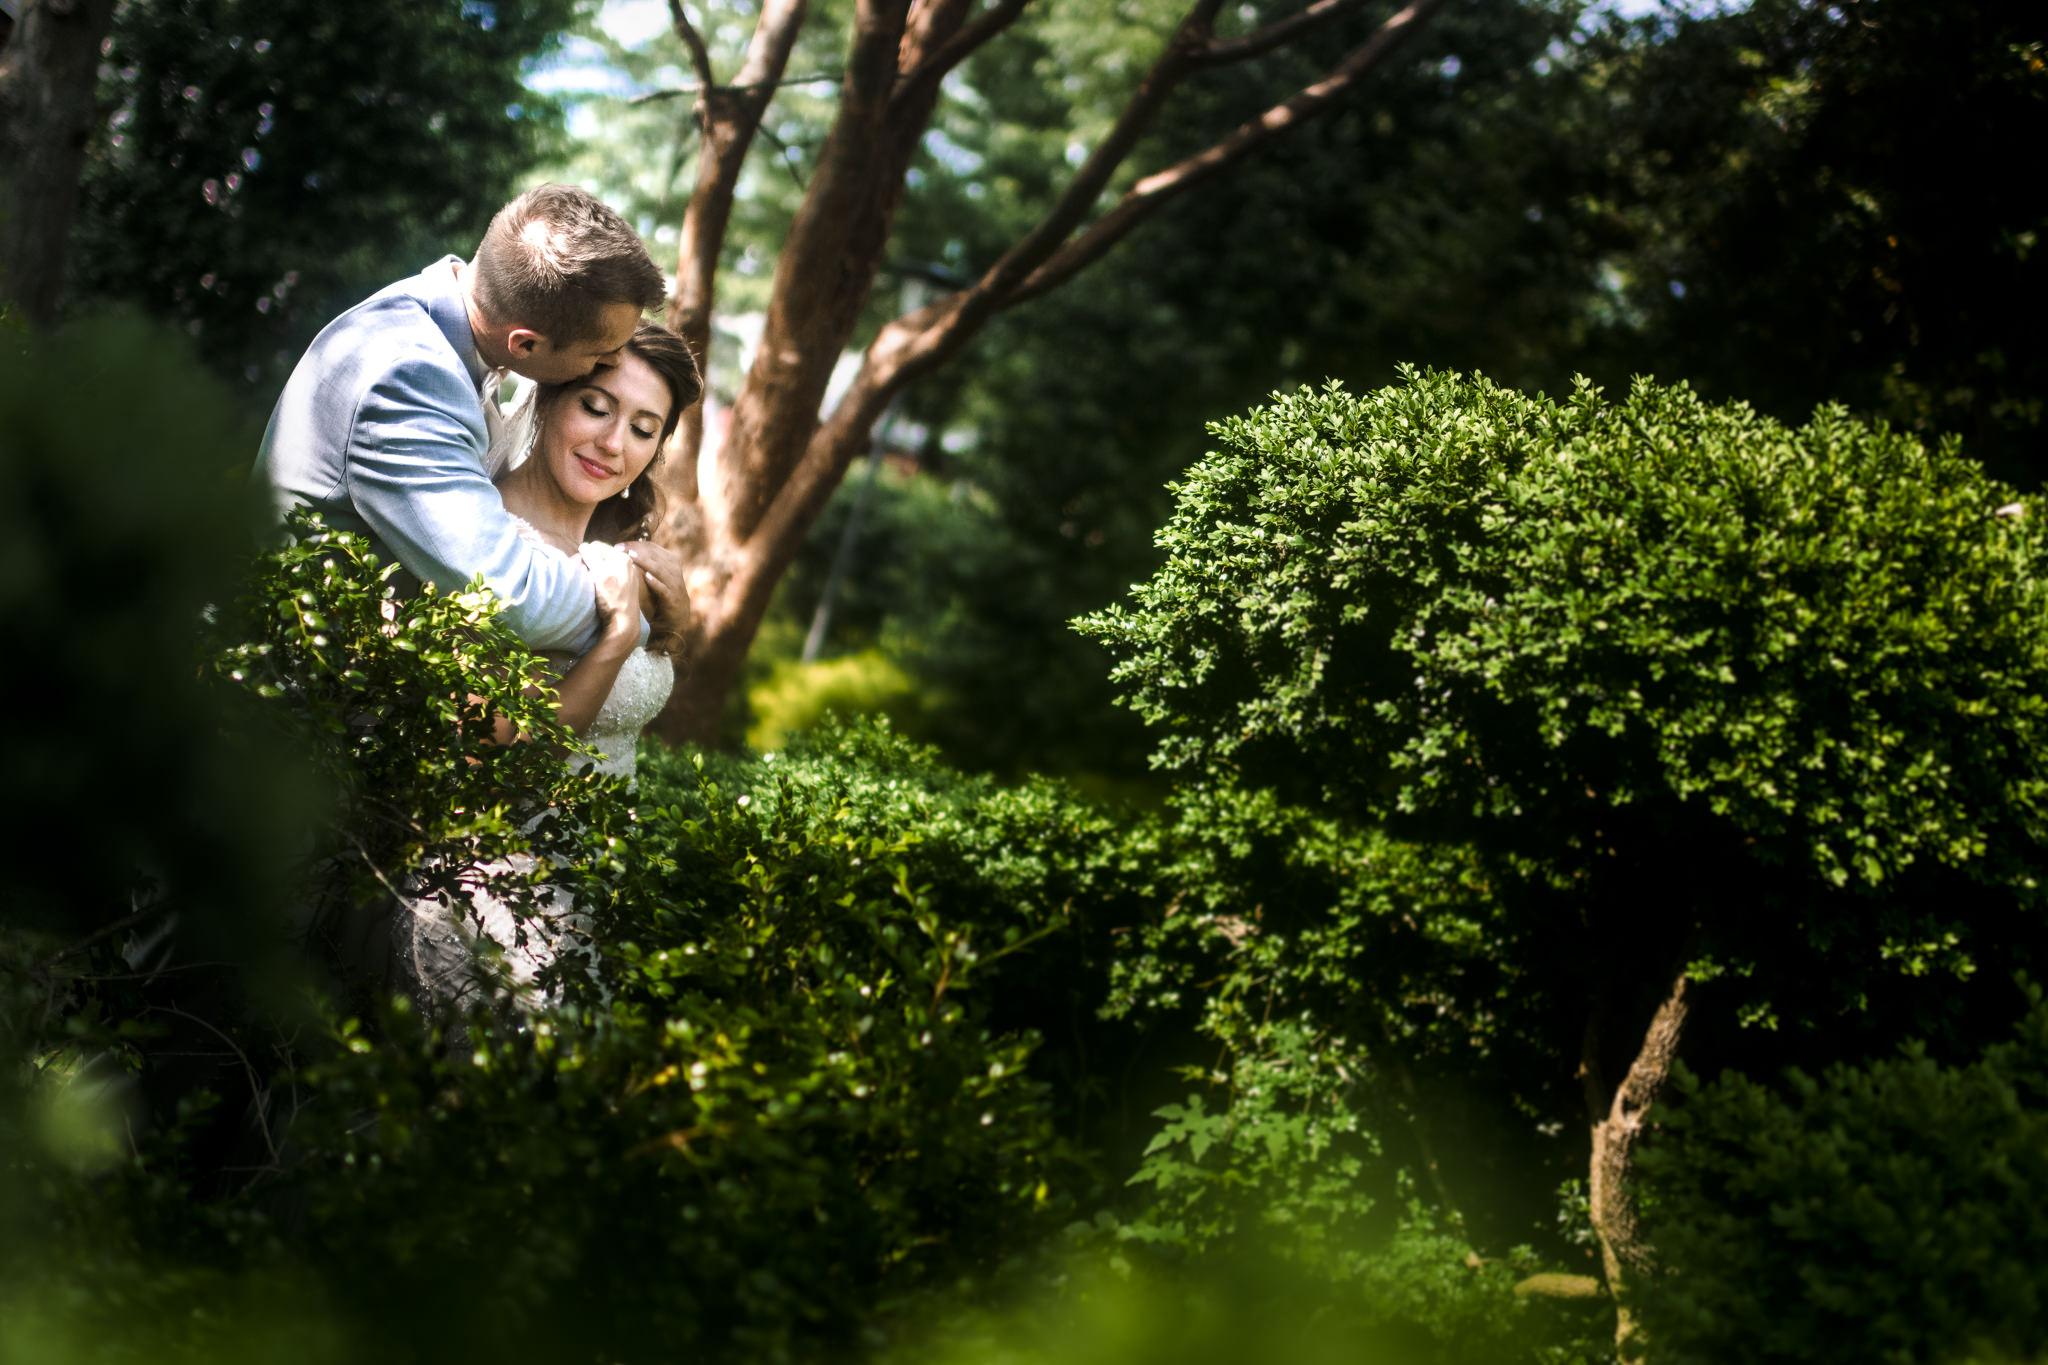 Barbato-Moorestown-Community-House-Wedding-New-Jersey-Photographer-23.JPG